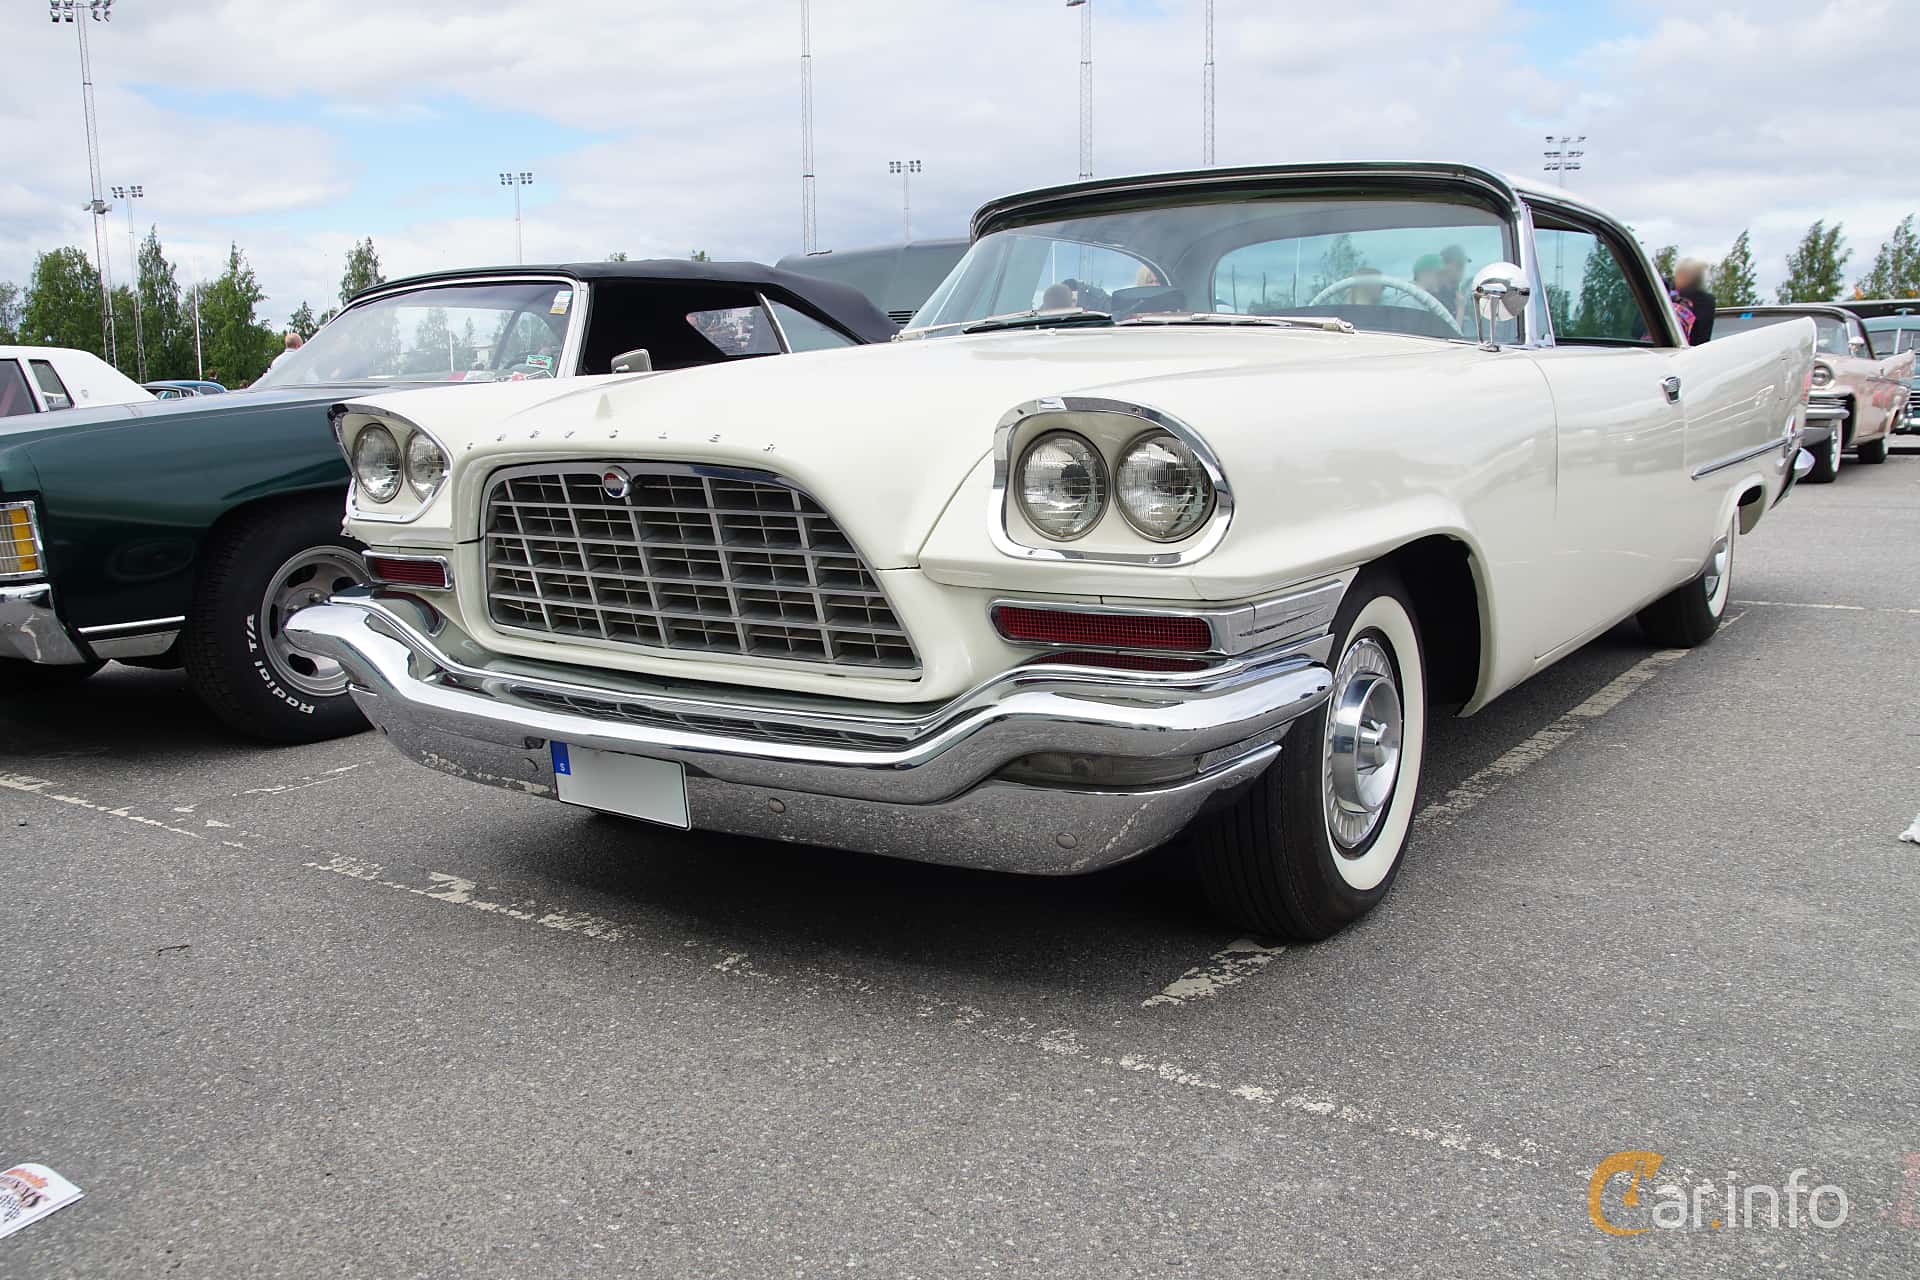 Chrysler 300C Hardtop 6.4 V8 TorqueFlite, 396hp, 1957 at Umeå Wheels Nations Norr 2019